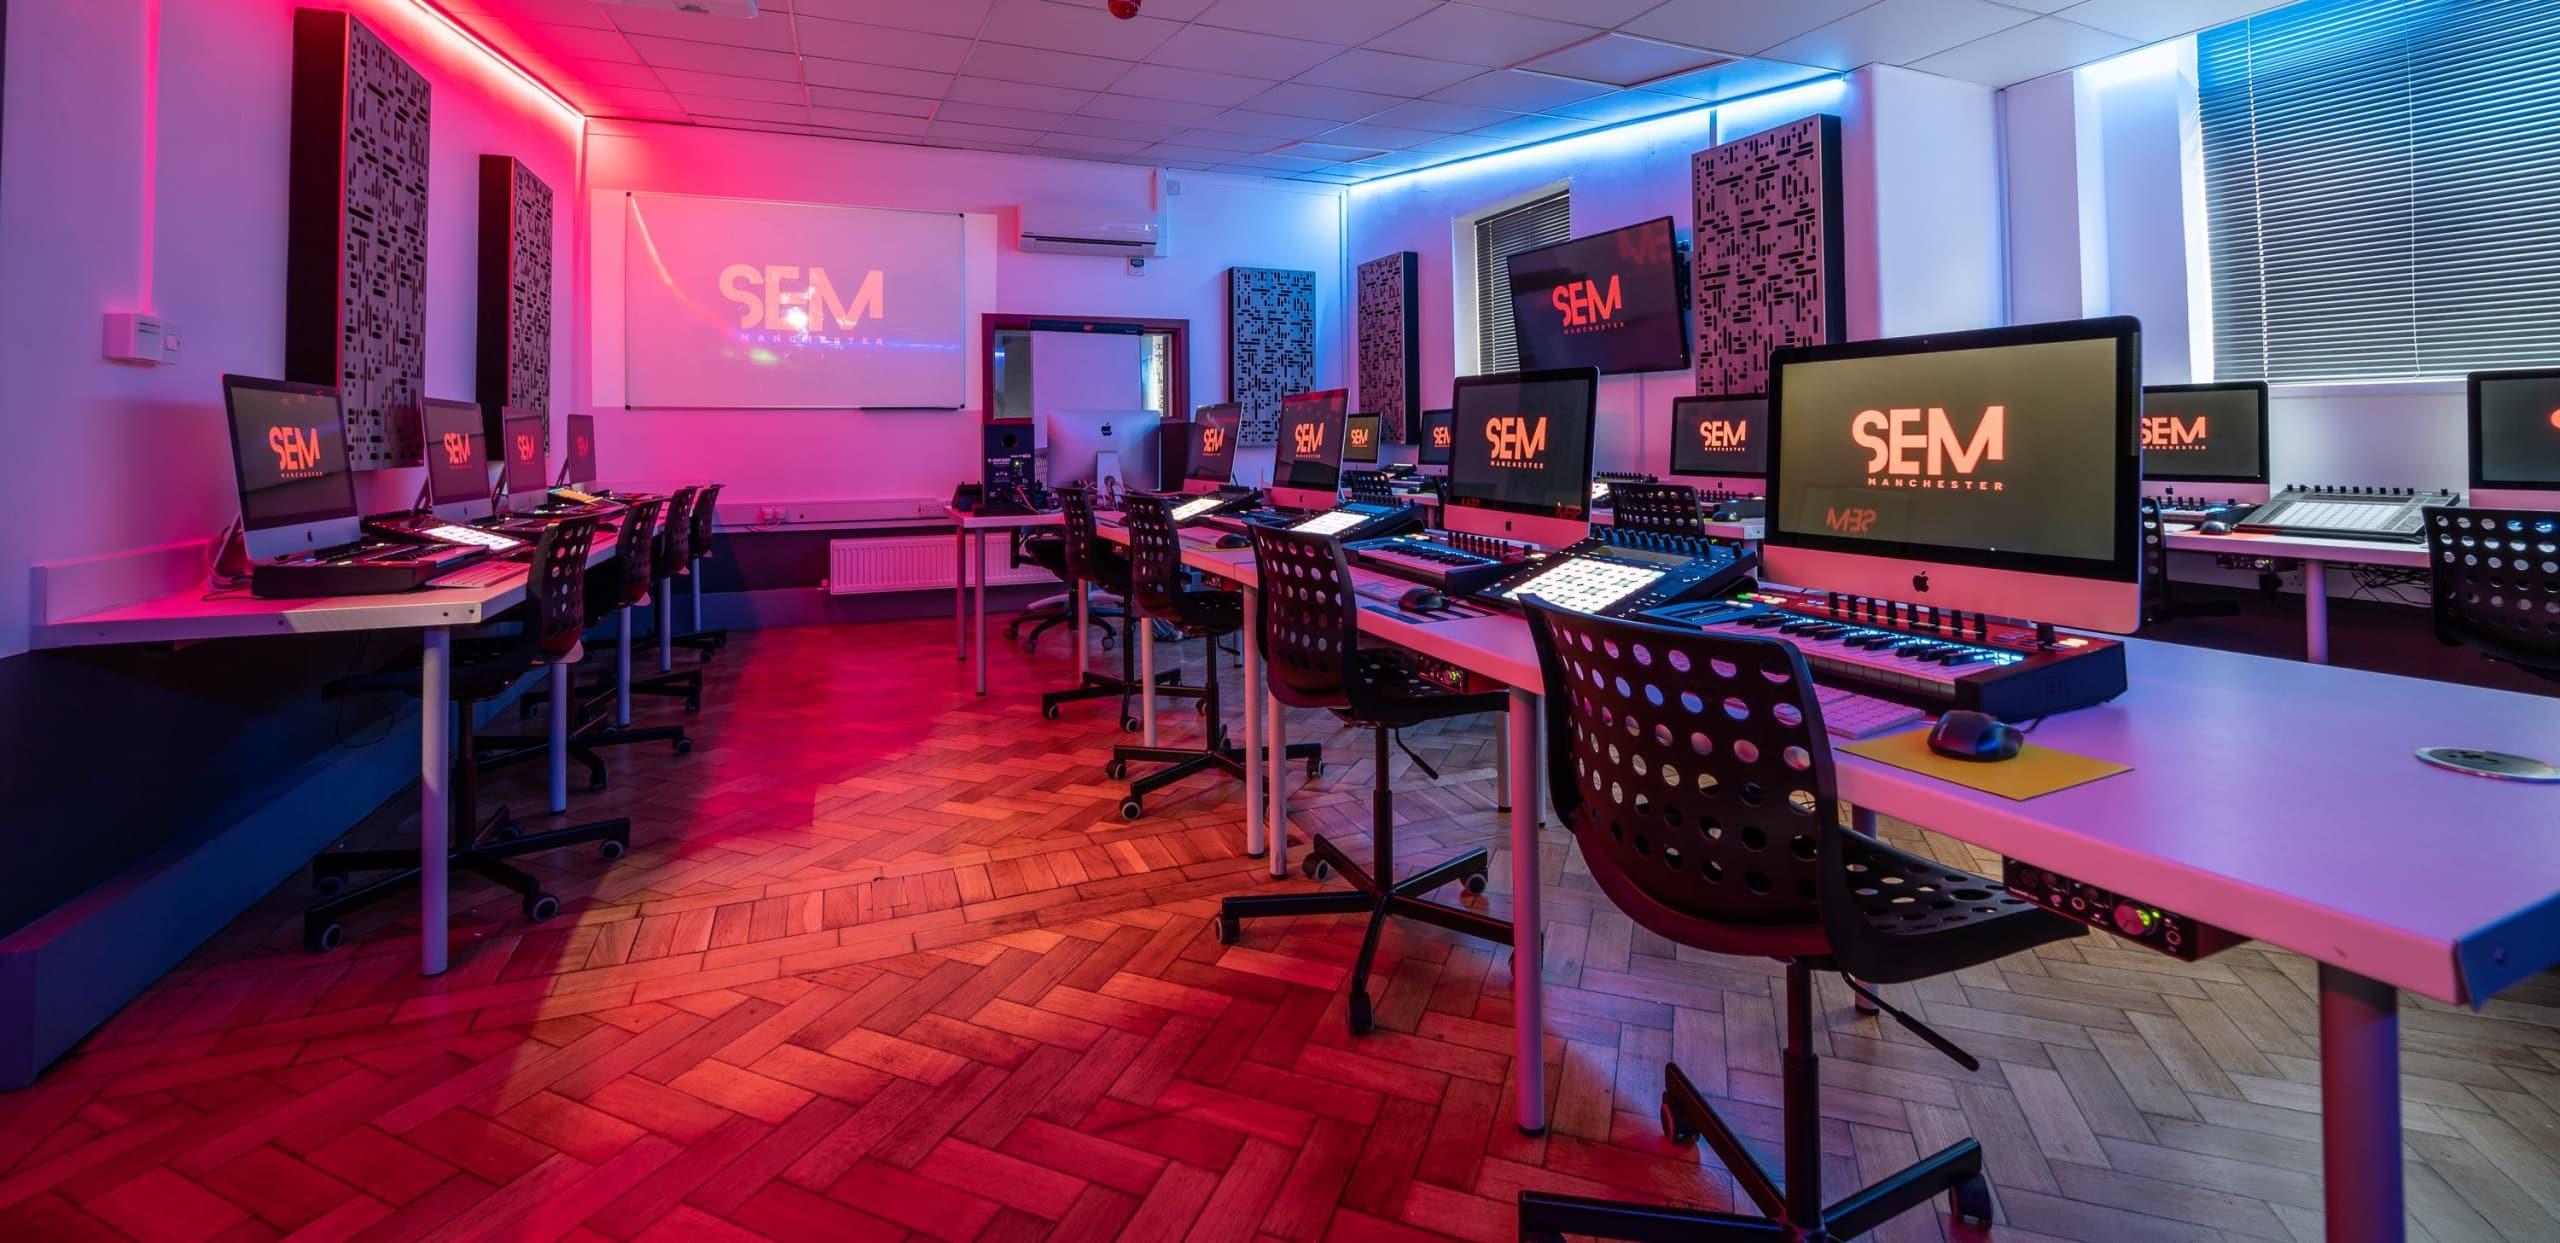 SEM-Midi-Lab-1-4-Galllery